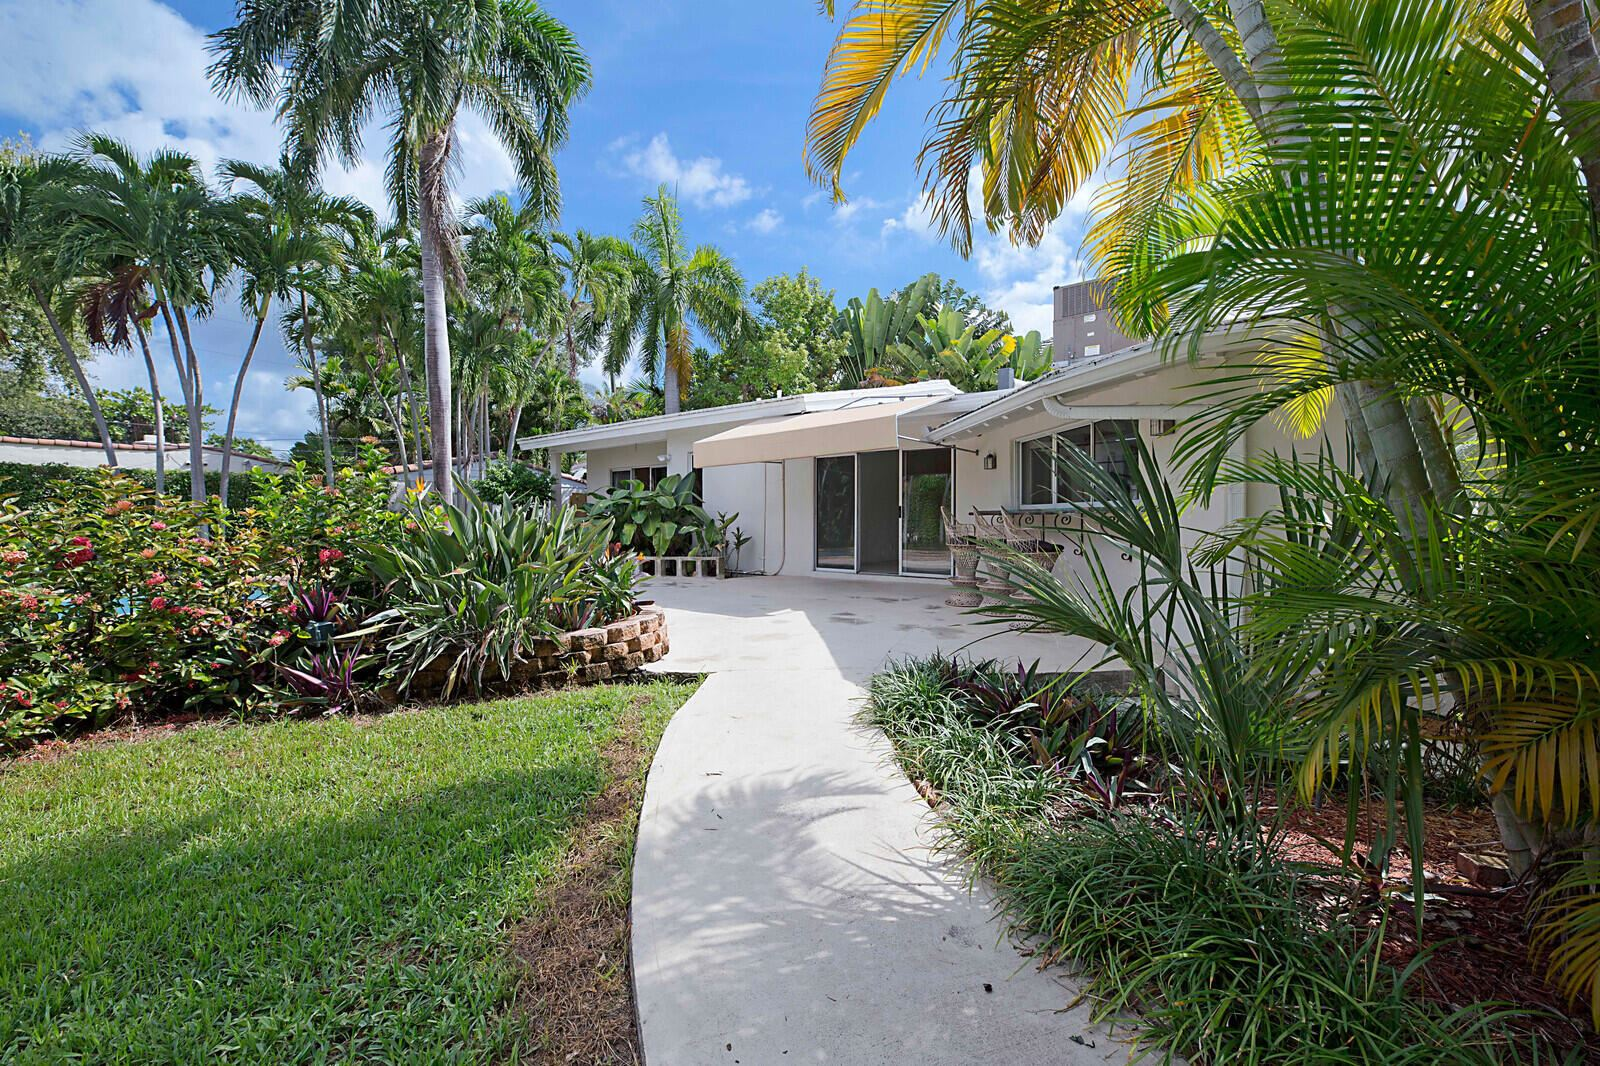 Photo of 2605 SE Datura Court, Fort Lauderdale, FL 33301 (MLS # RX-10741558)